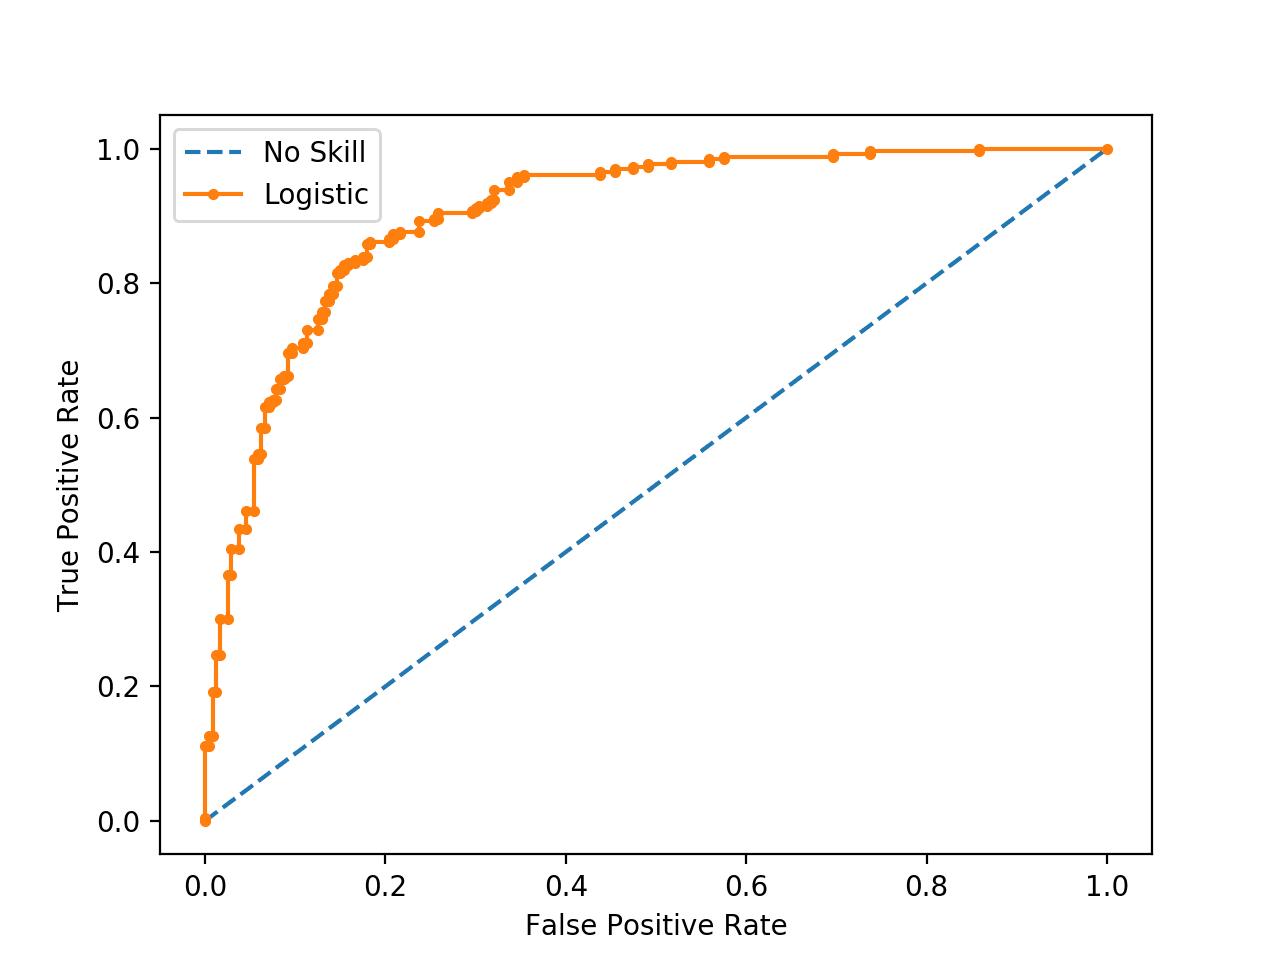 ROC Curve of a Logistic Regression Model and a No Skill Classifier